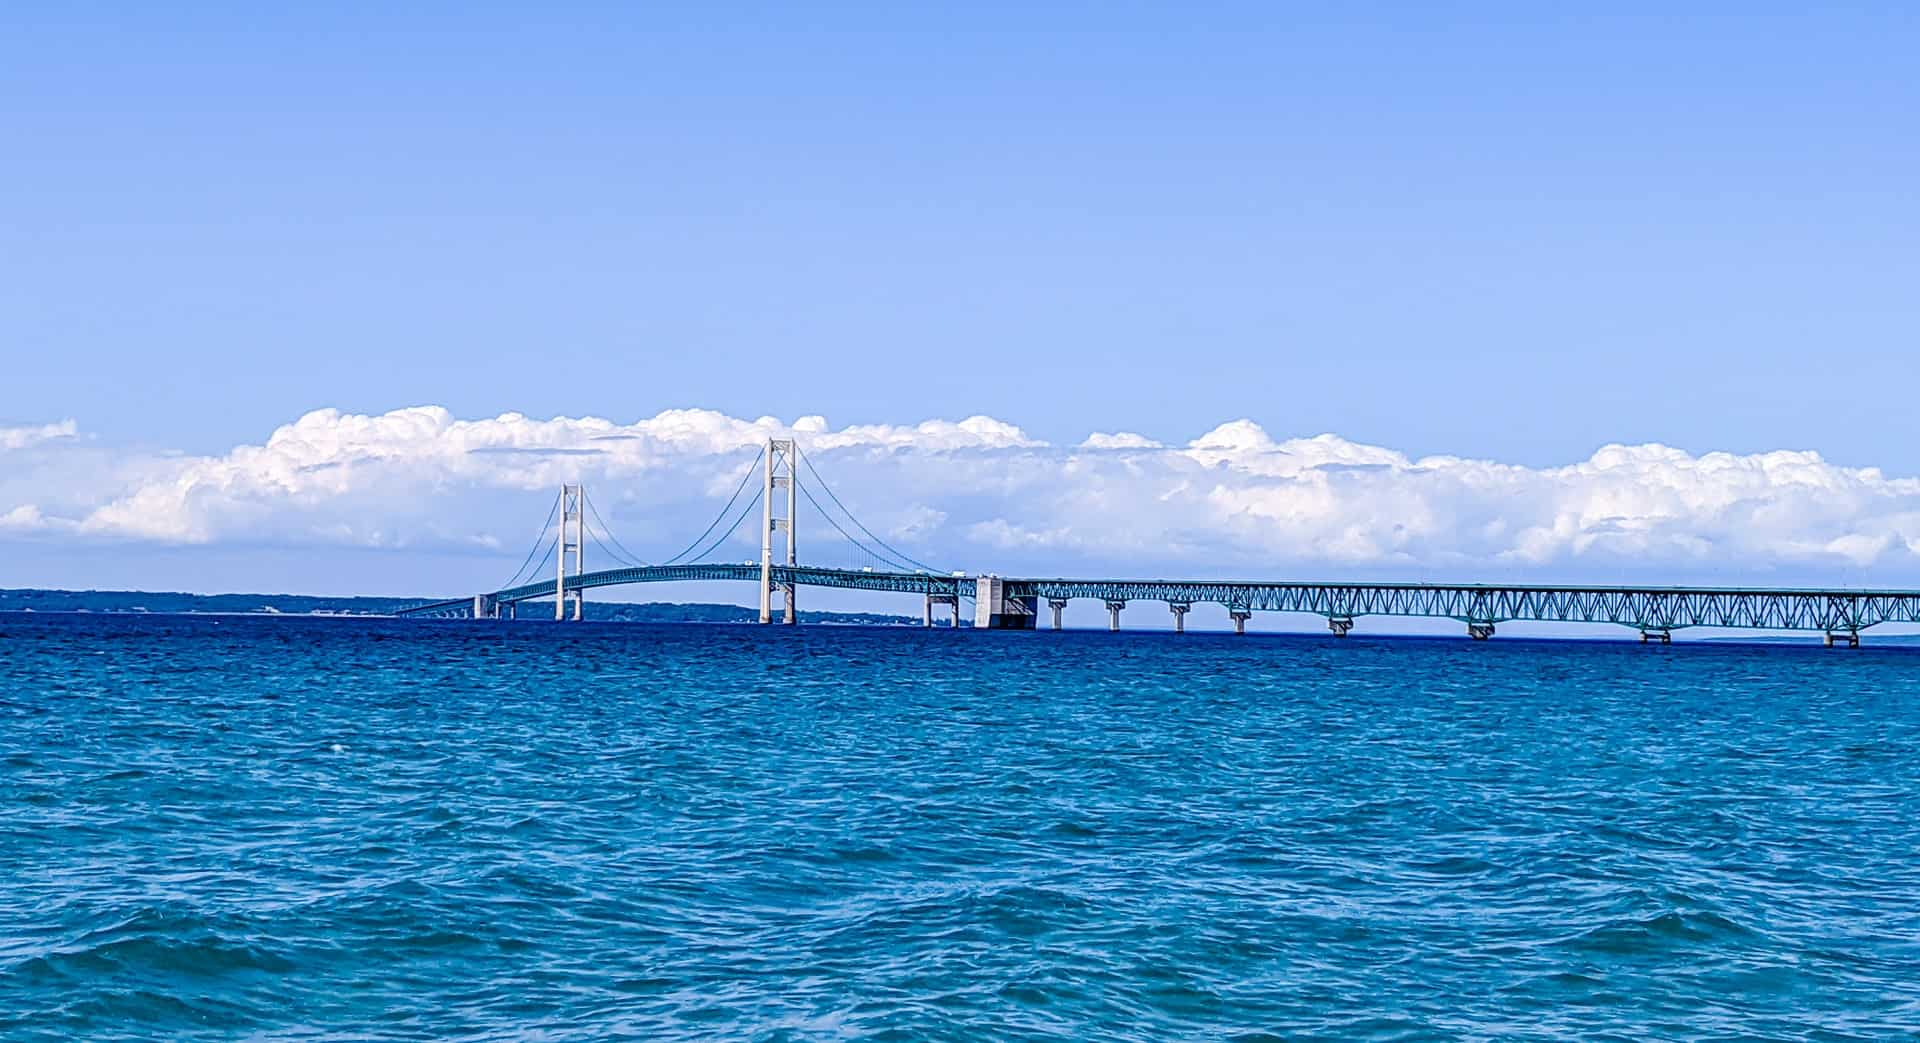 Mackinac Bridge across the water